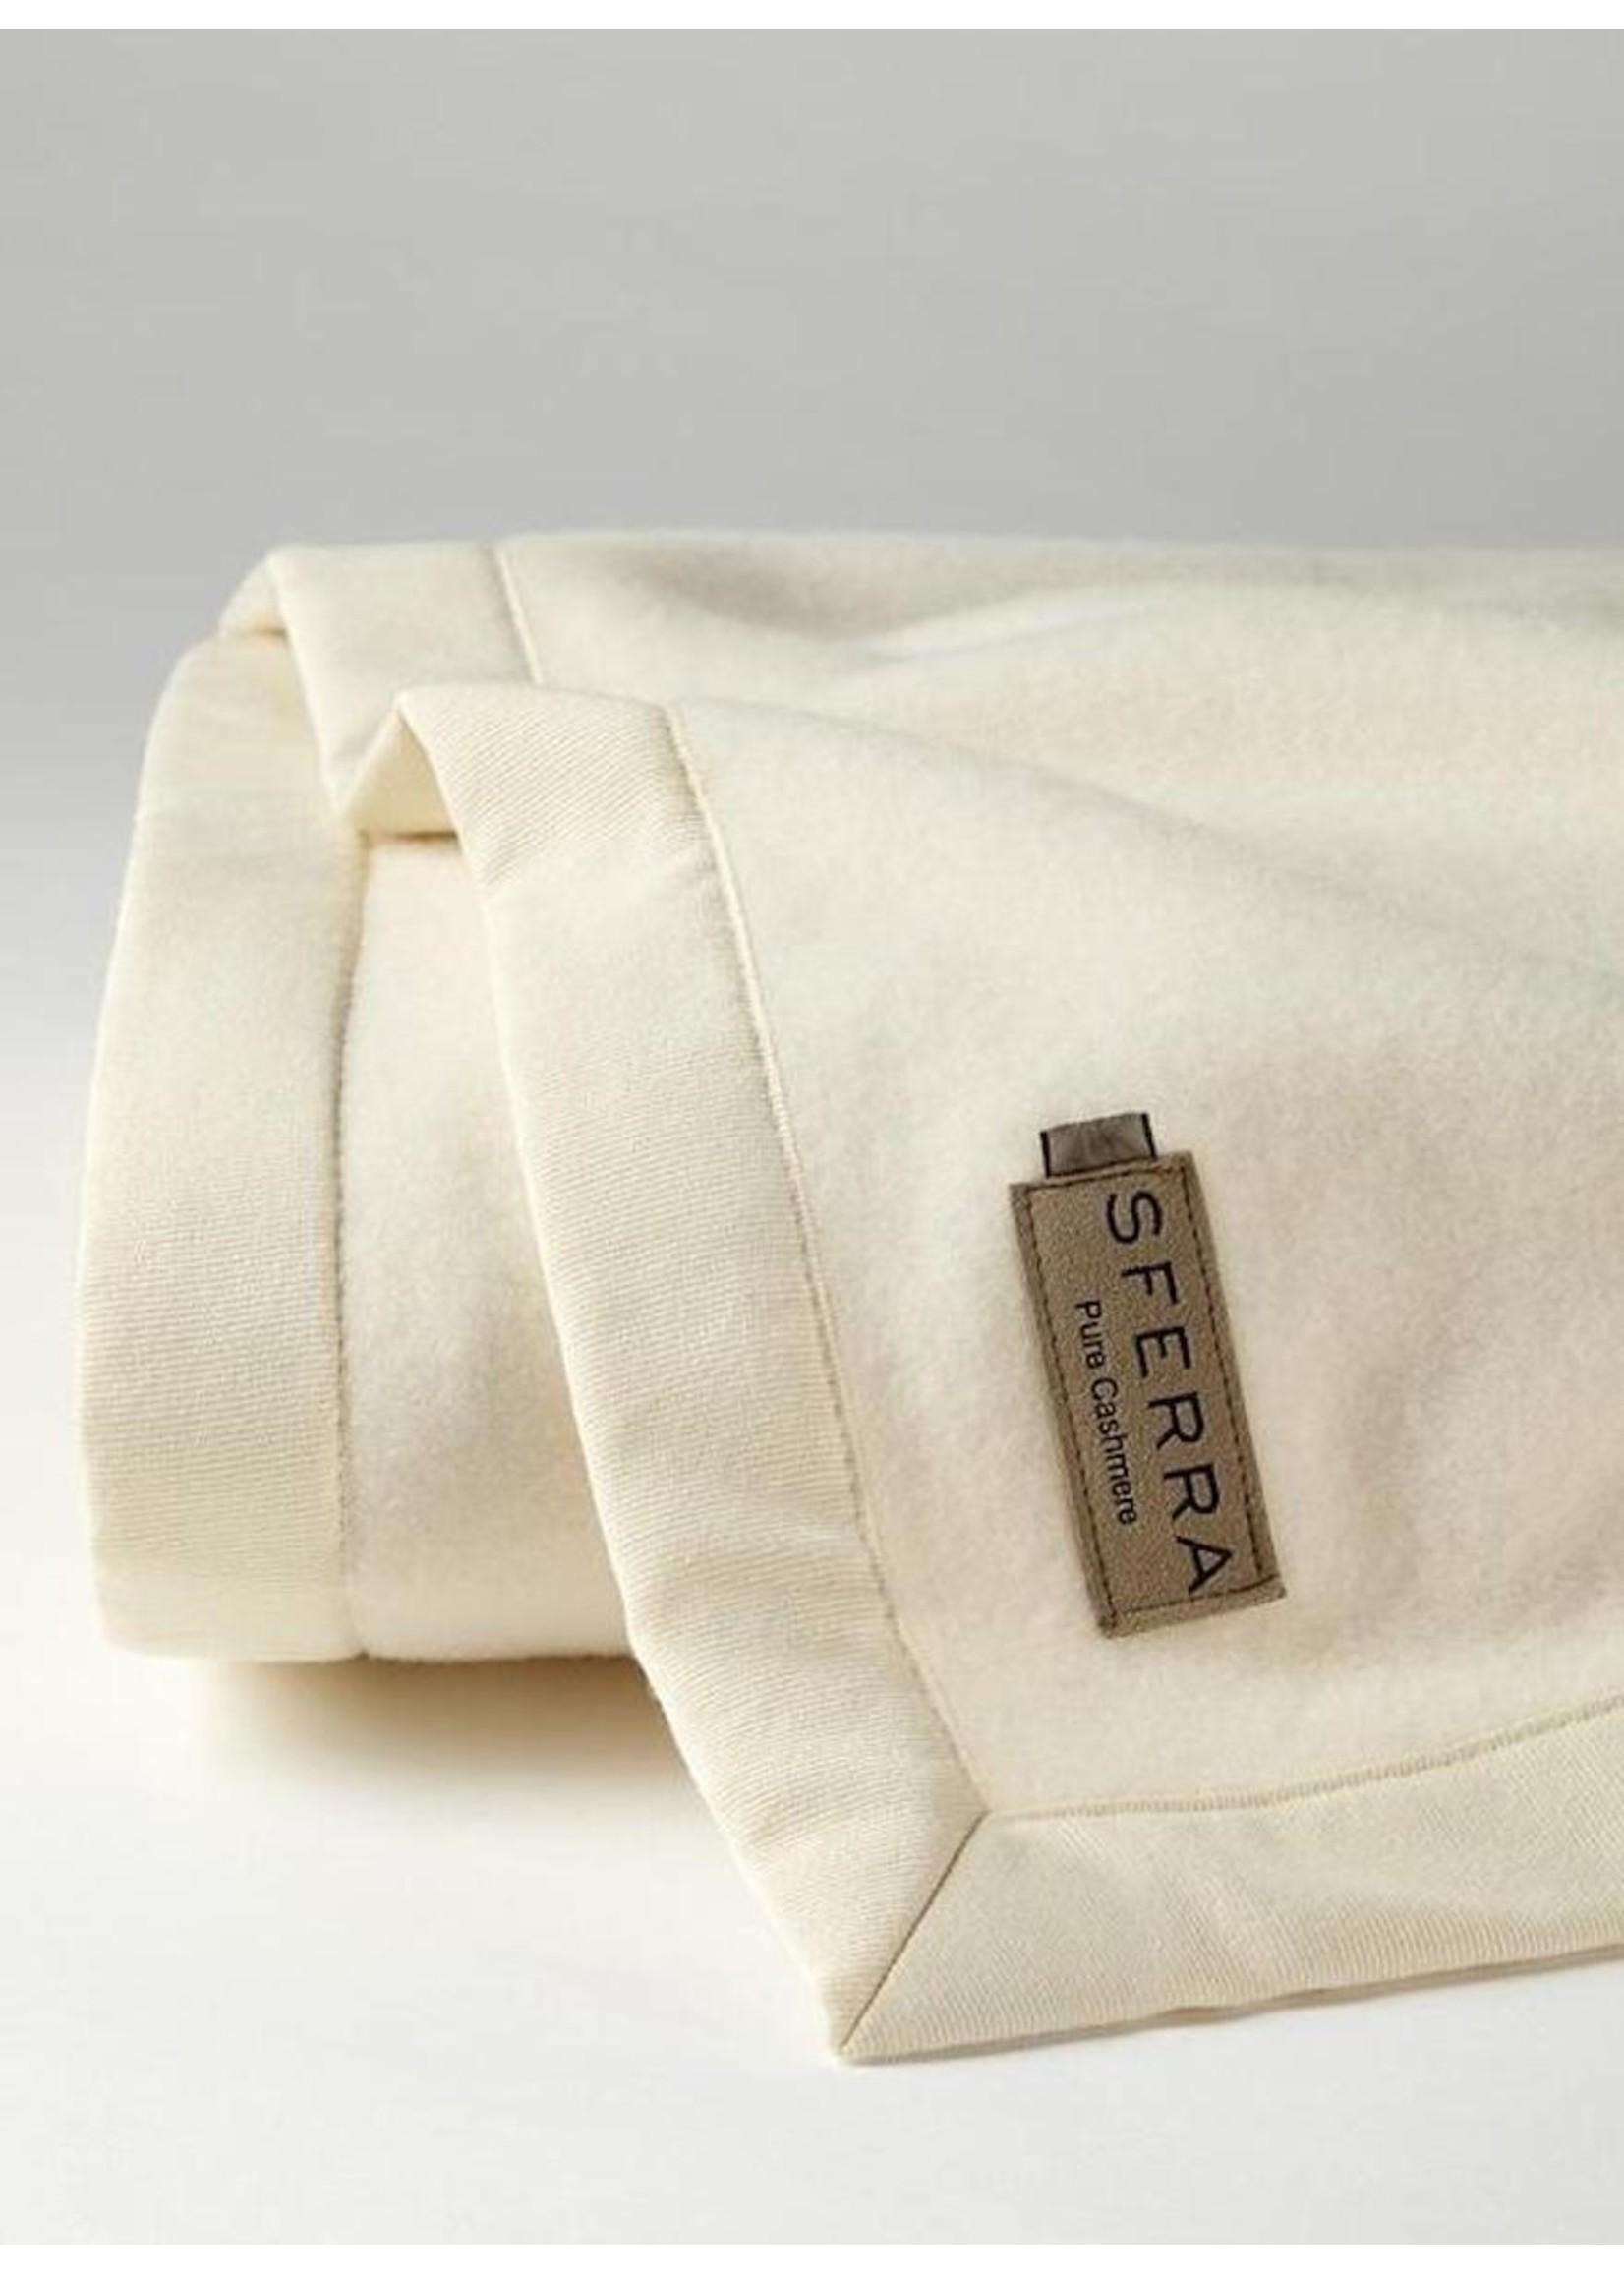 Sferra Sferra Savoy Blankets